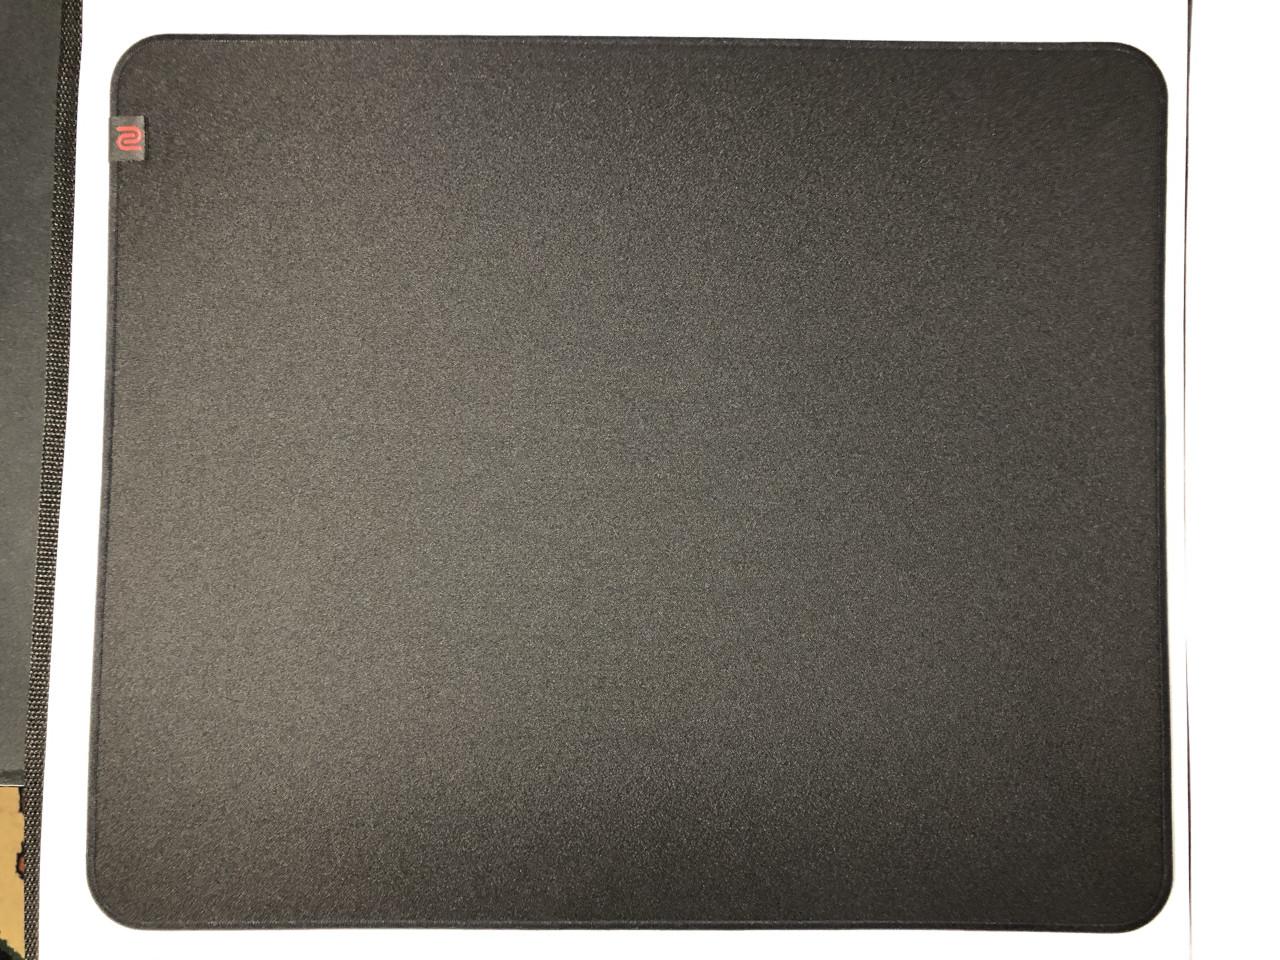 表面の質感比較-GTF-X